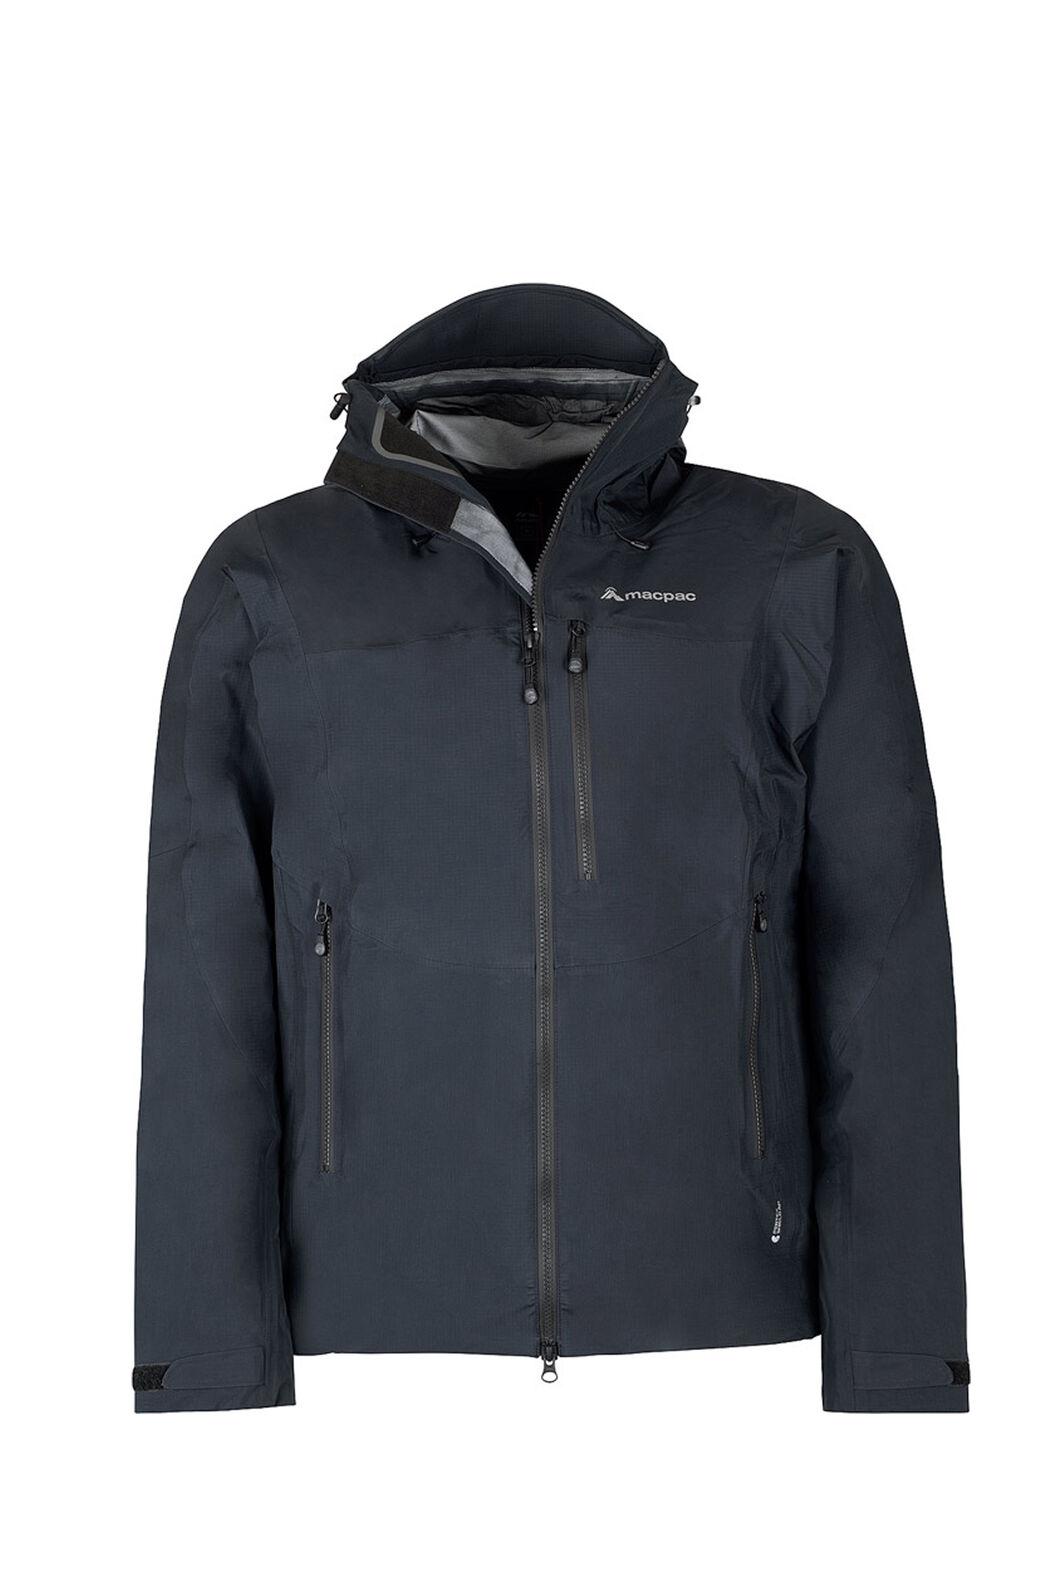 Macpac Lightweight Prophet Pertex® Rain Jacket - Men's, Black/Black, hi-res